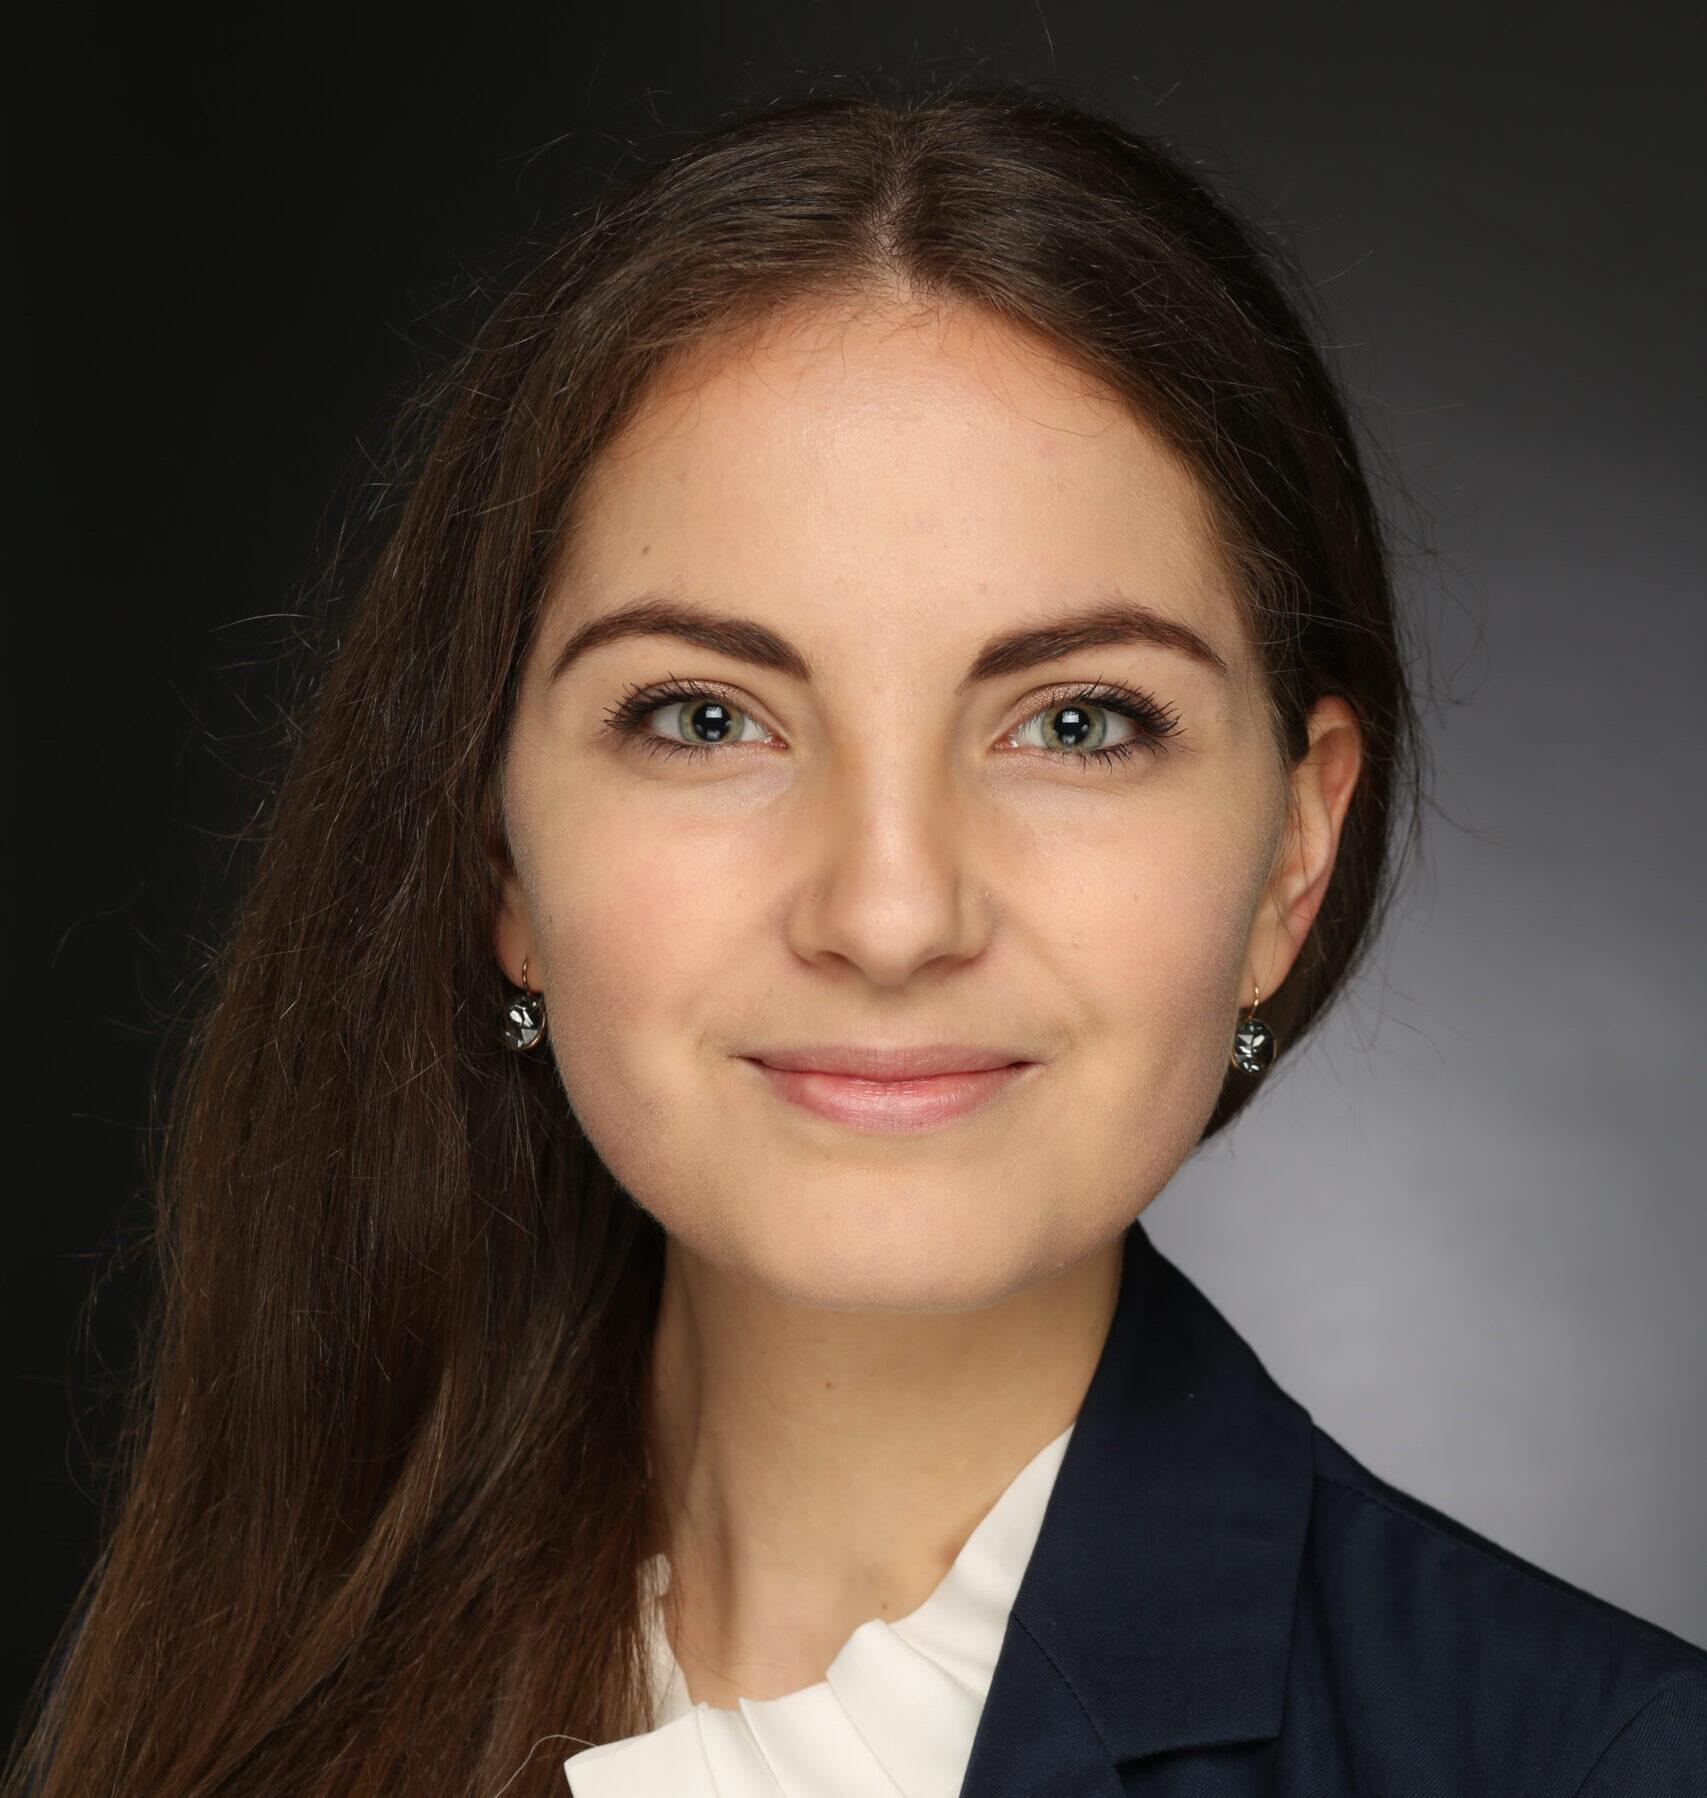 Erika Switkowski